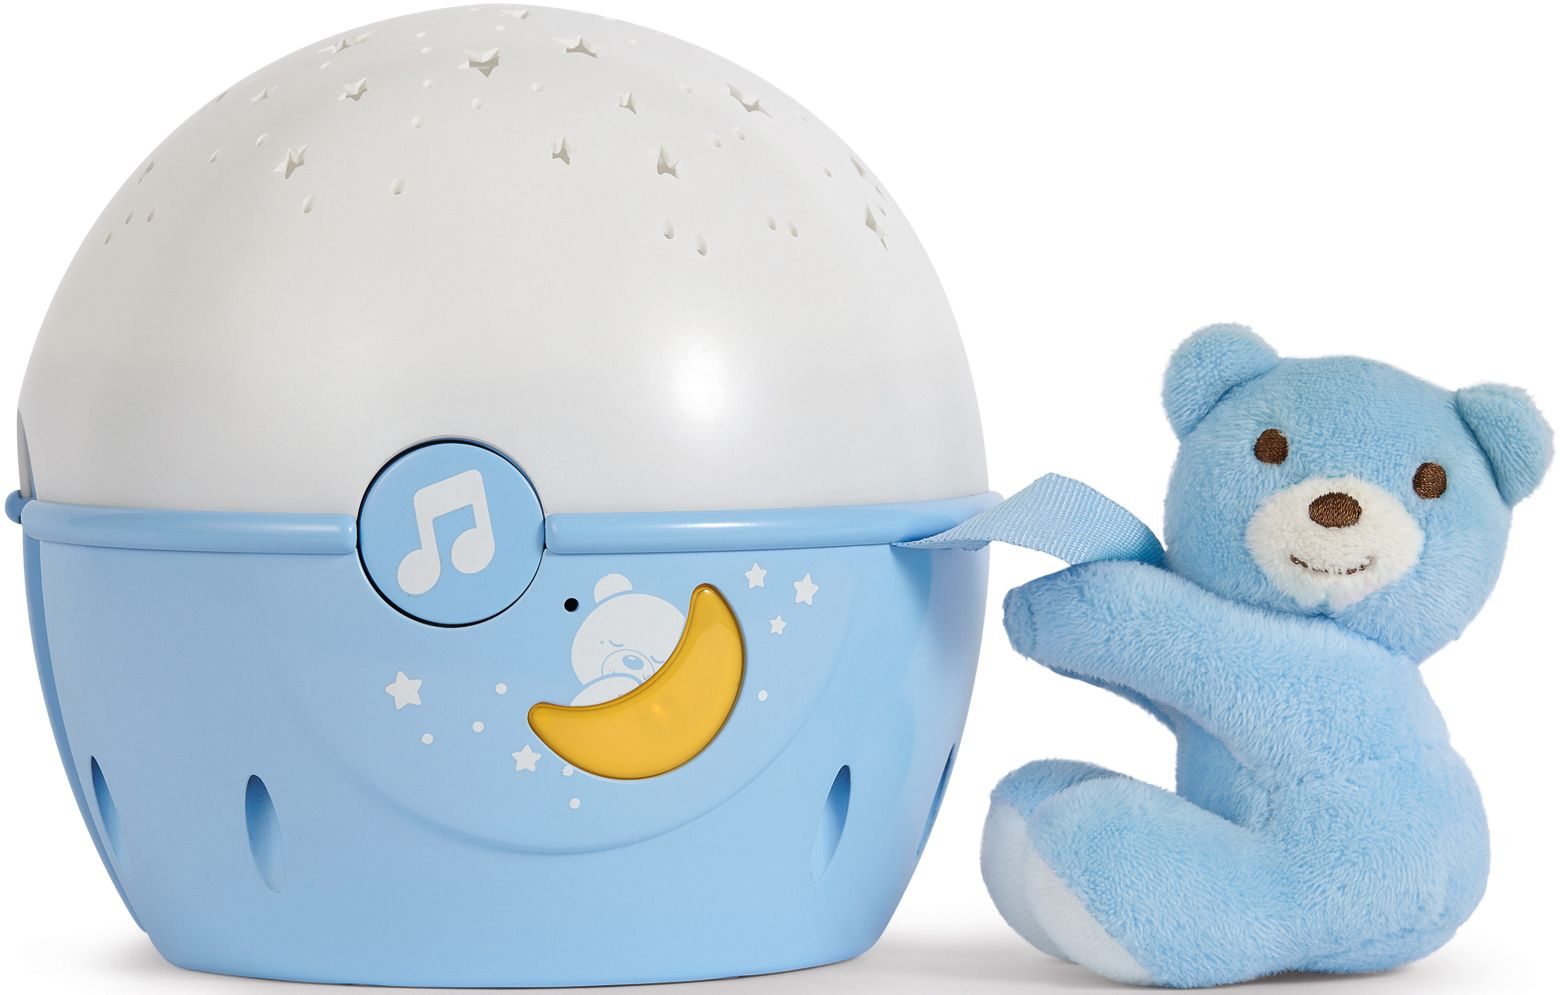 CHICCO Chicco® 2in1 Projektor mit Soundfunktion, »First Dreams Next 2 Stars Nachtlicht, Hellblau«